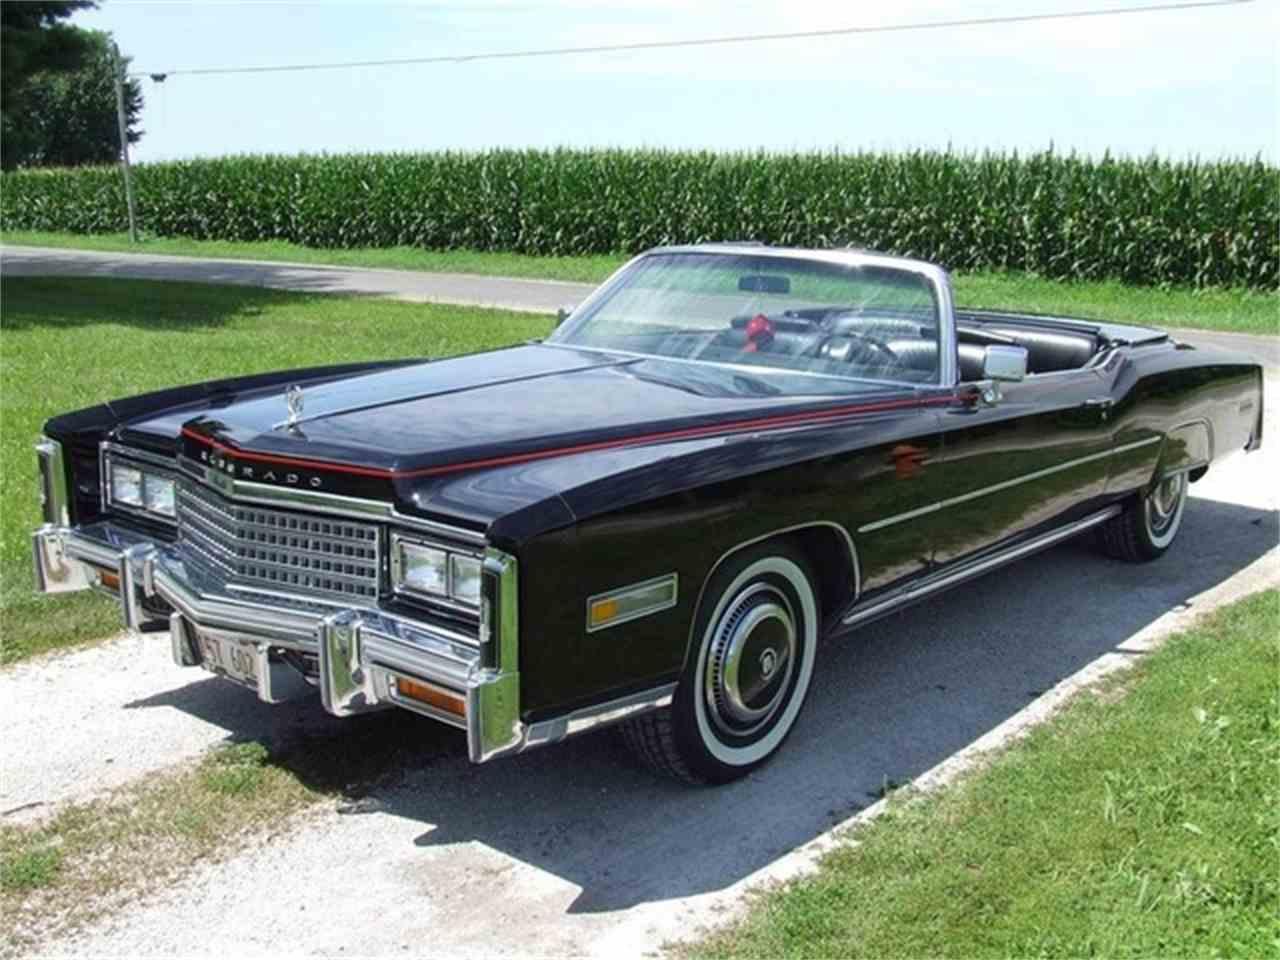 1978 Cadillac Eldorado for Sale - CC-561863